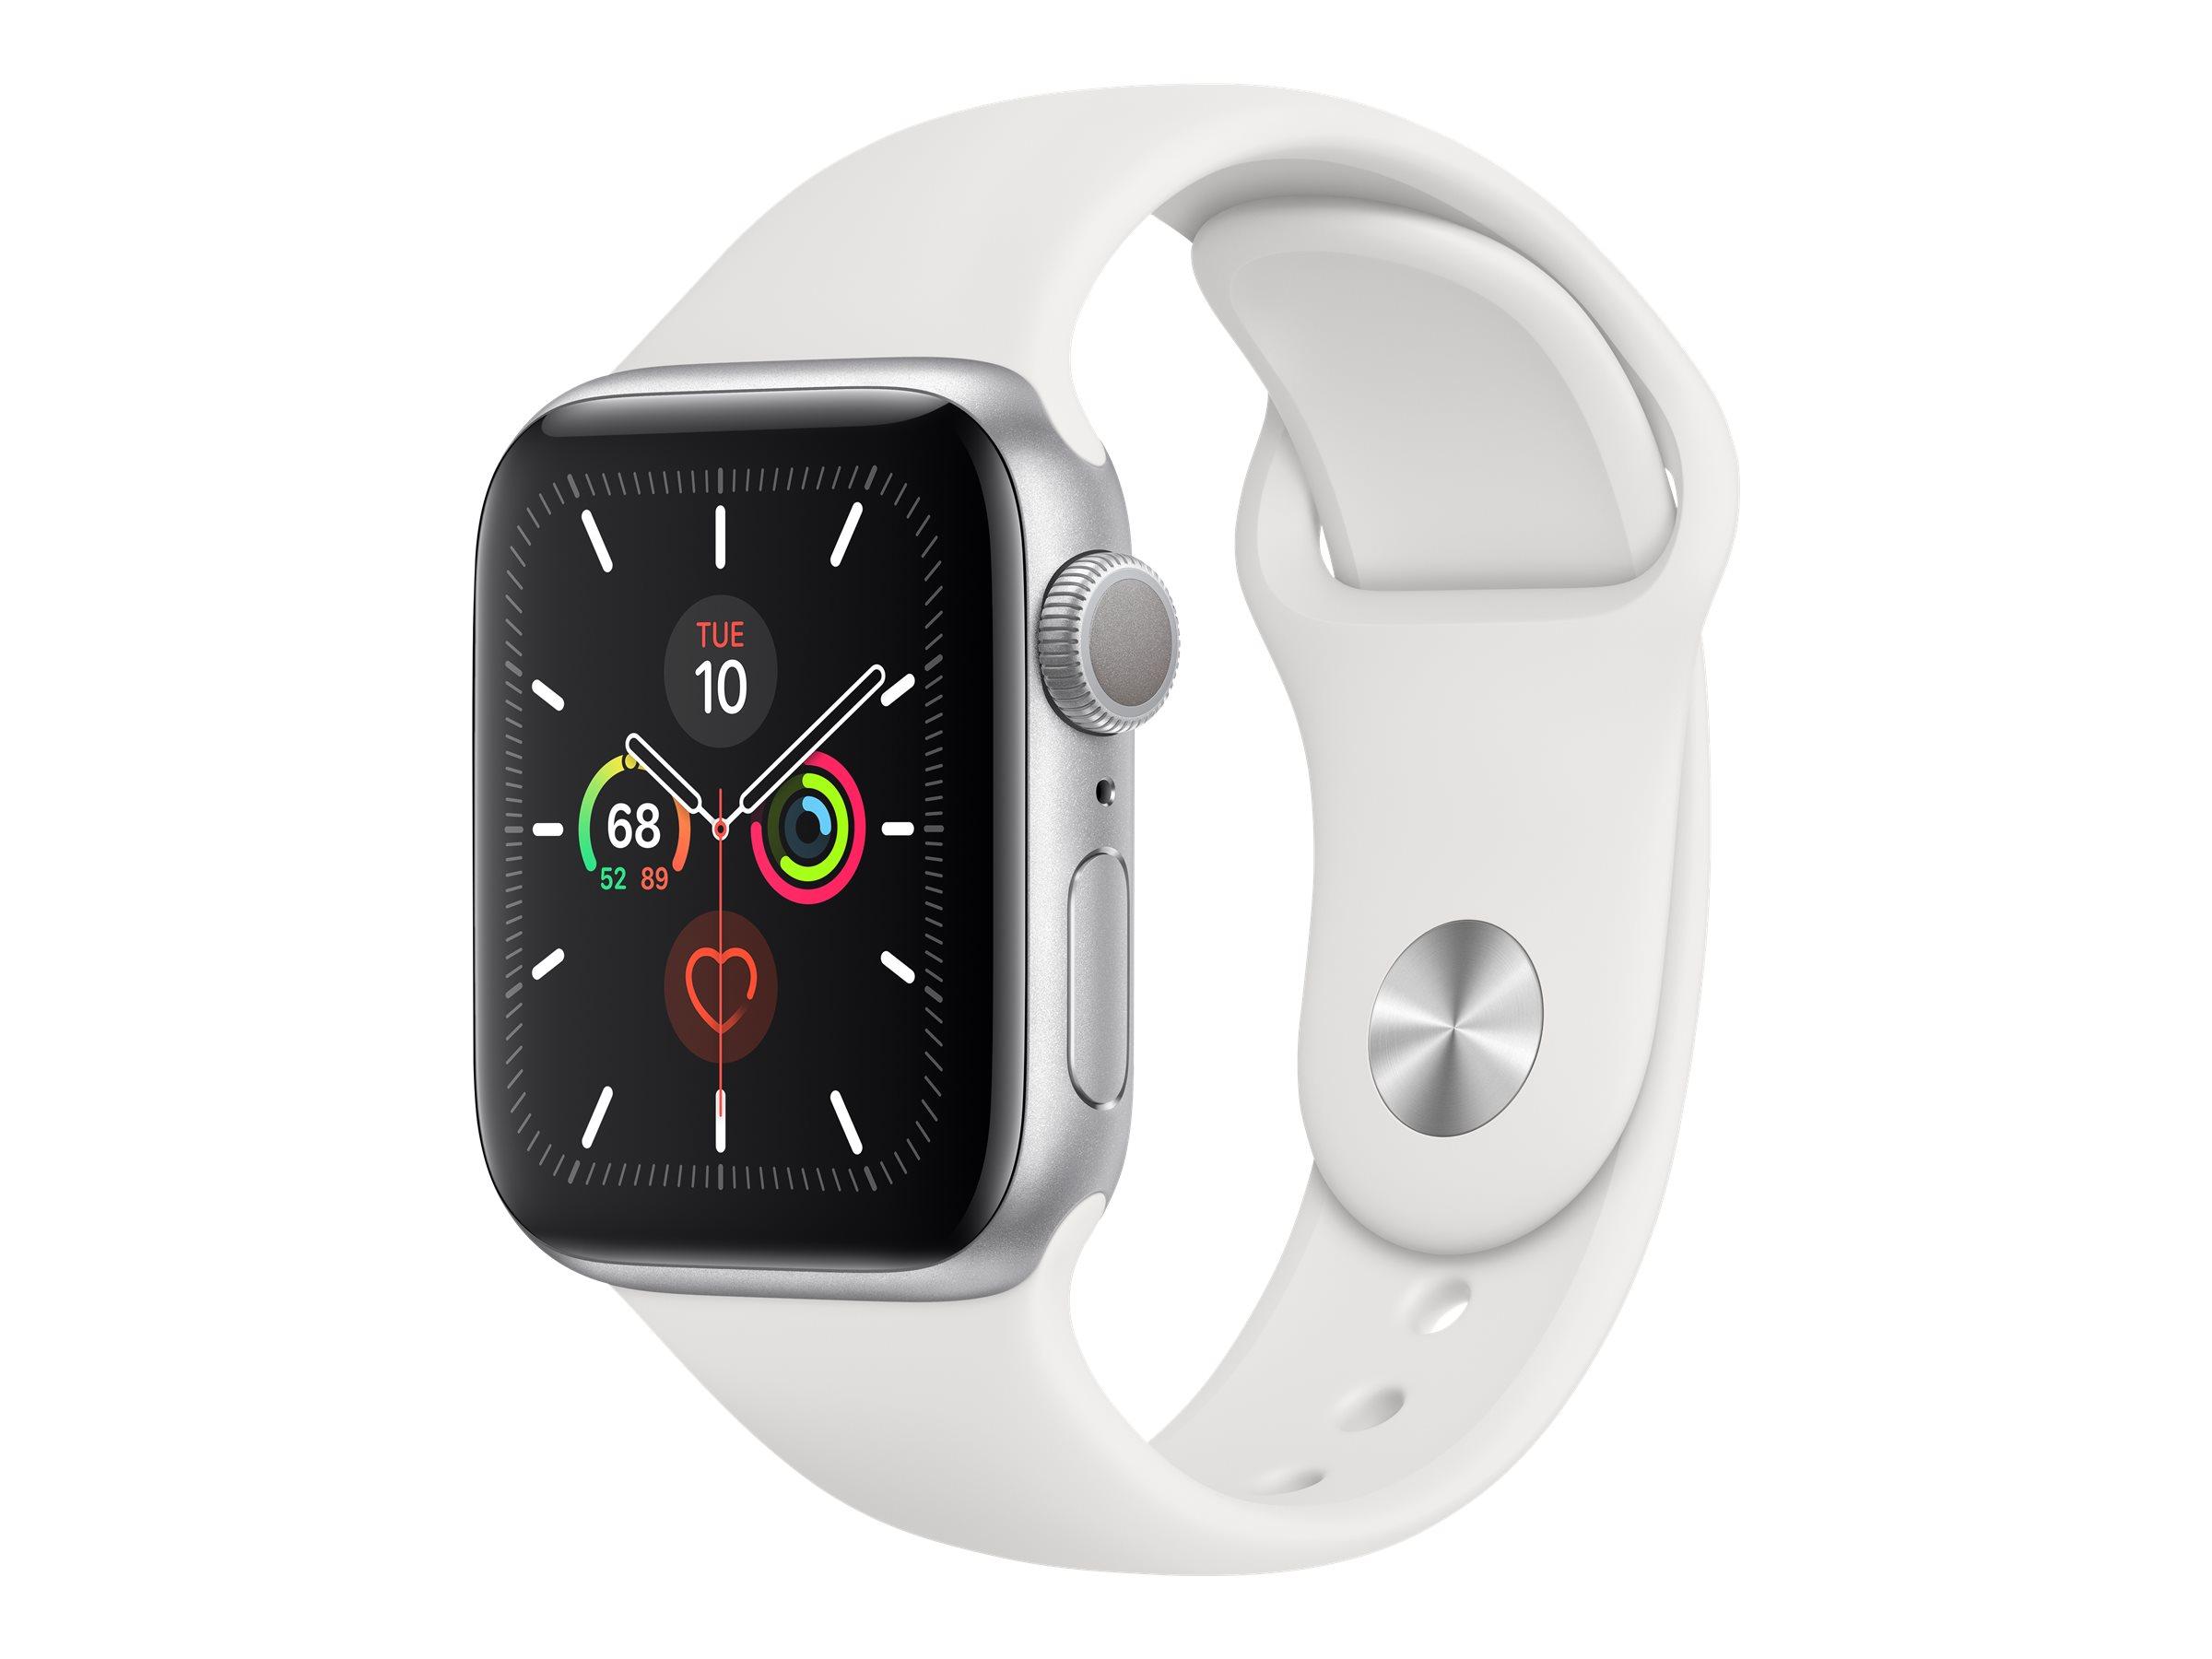 Apple Watch Series 5 (GPS + Cellular) - 40 mm